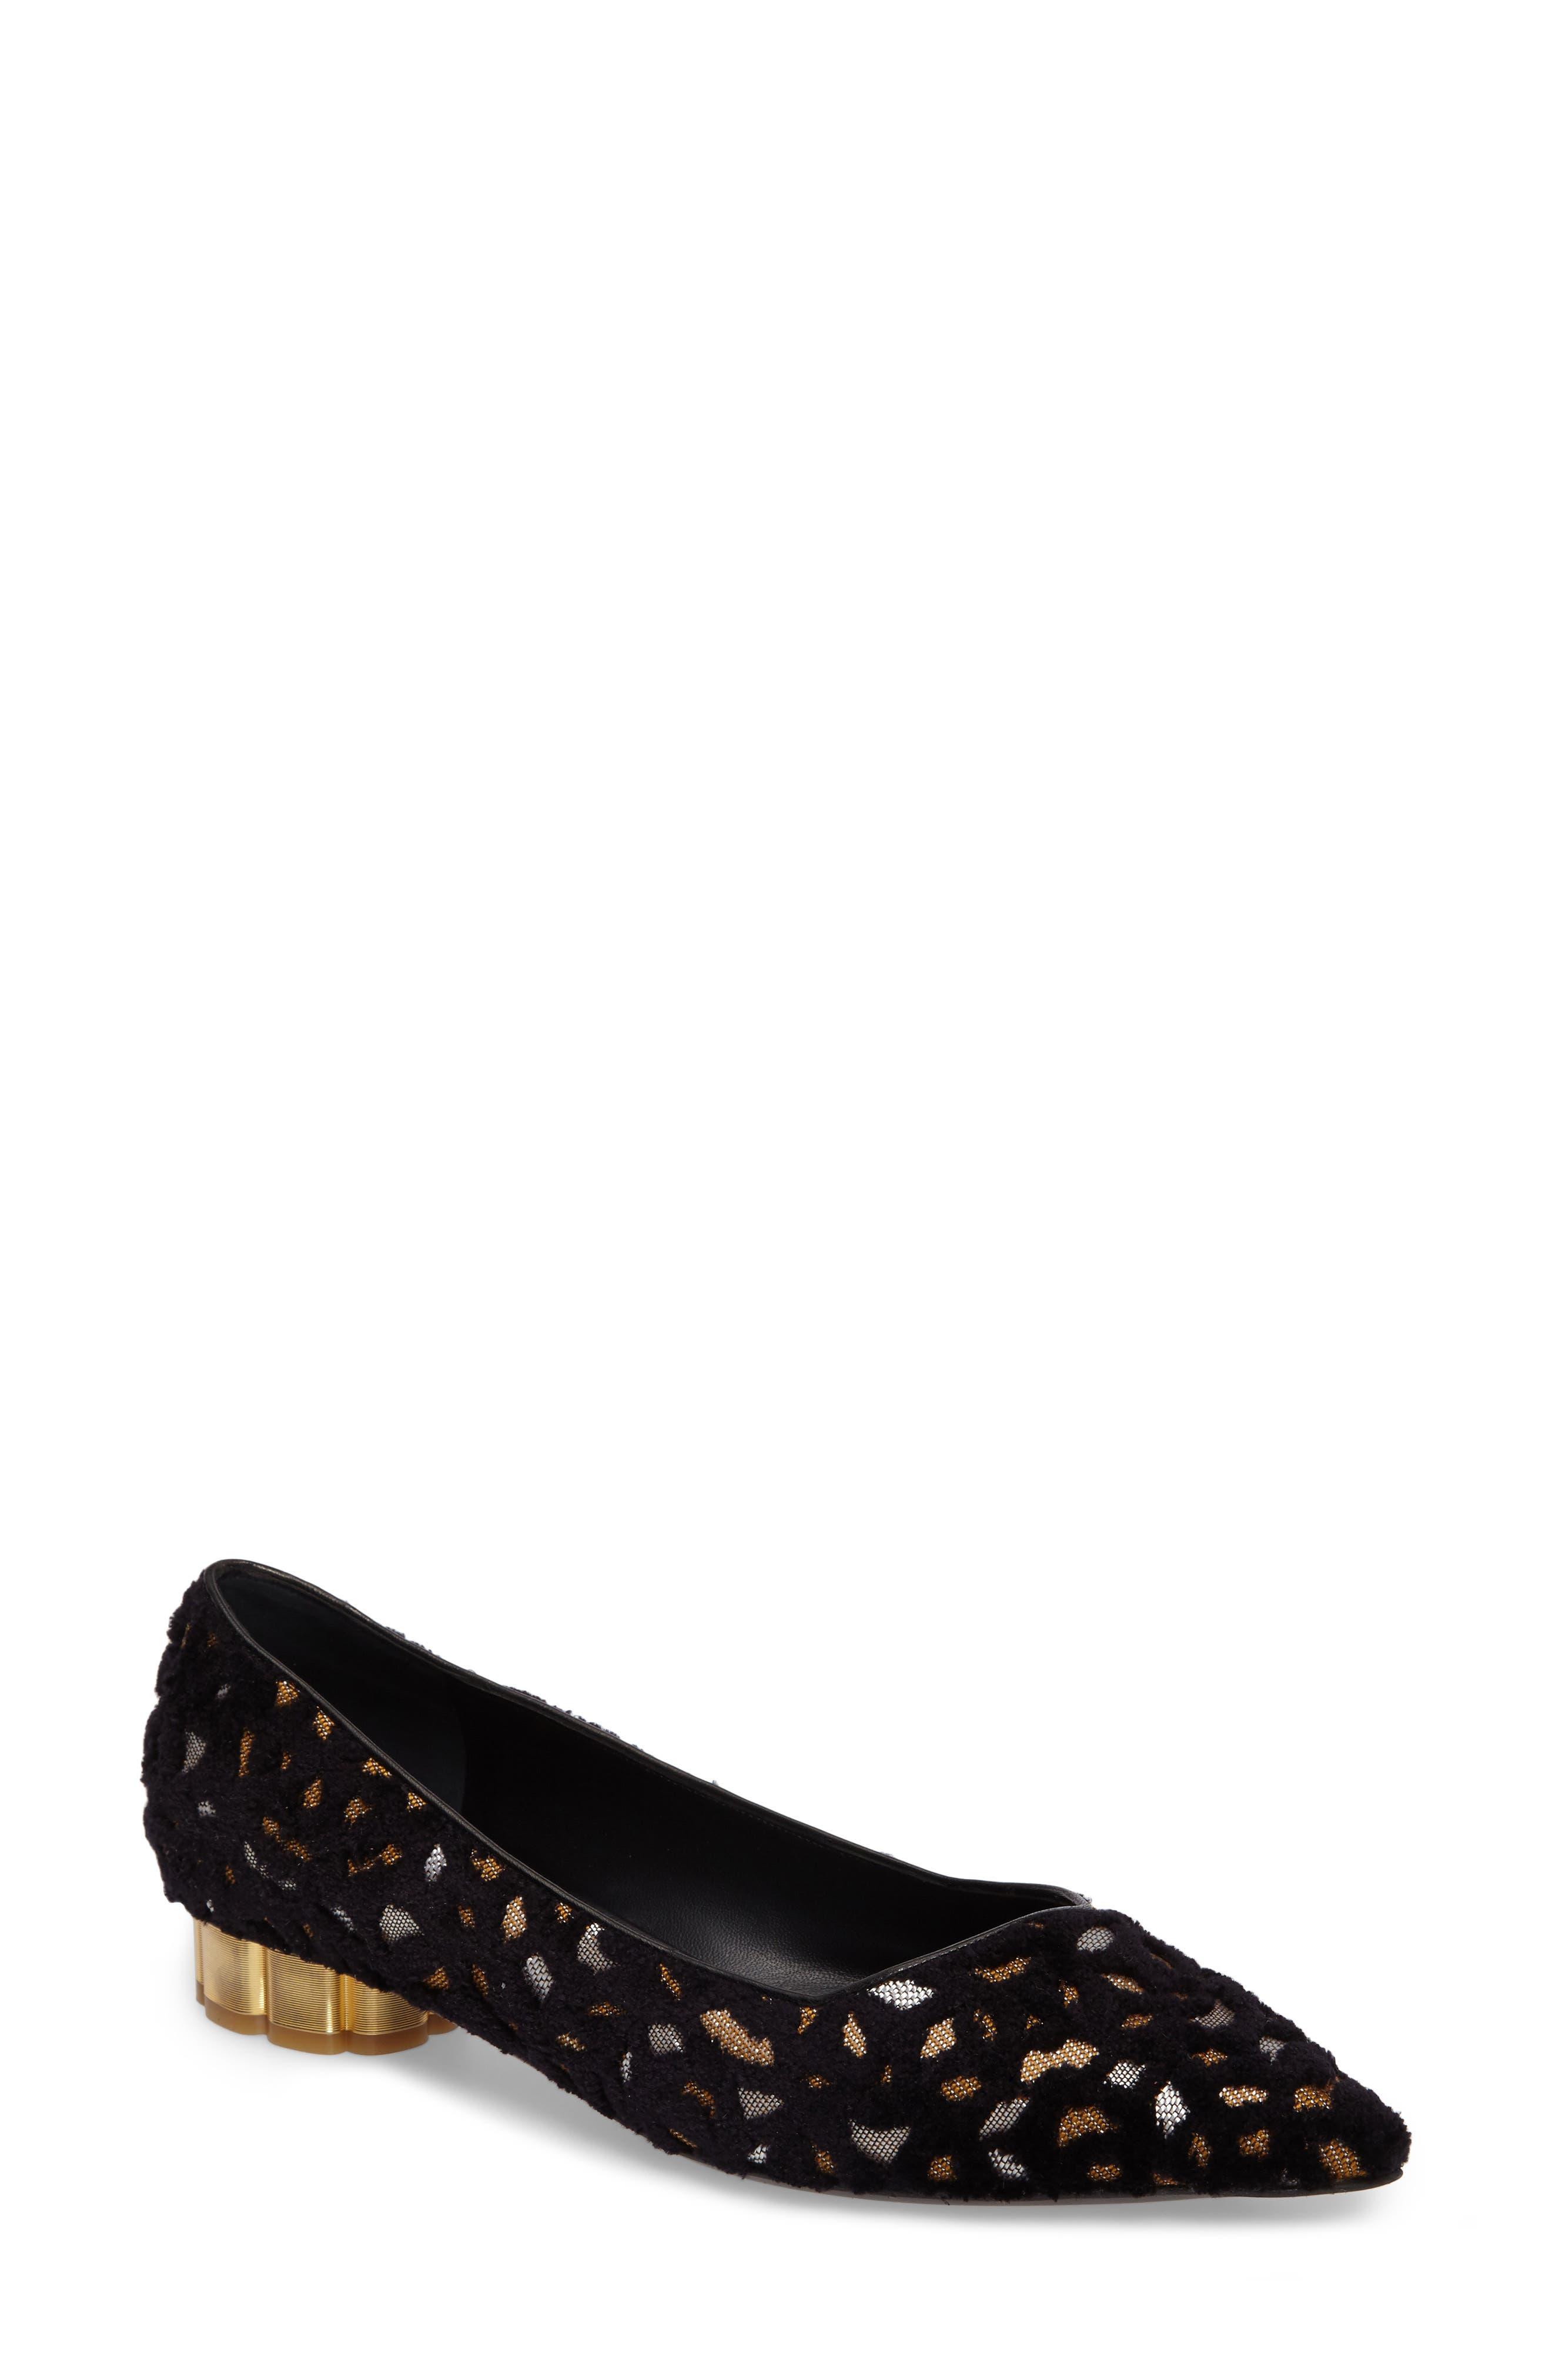 Main Image - Salvatore Ferragamo Flower Heel Flat (Women)